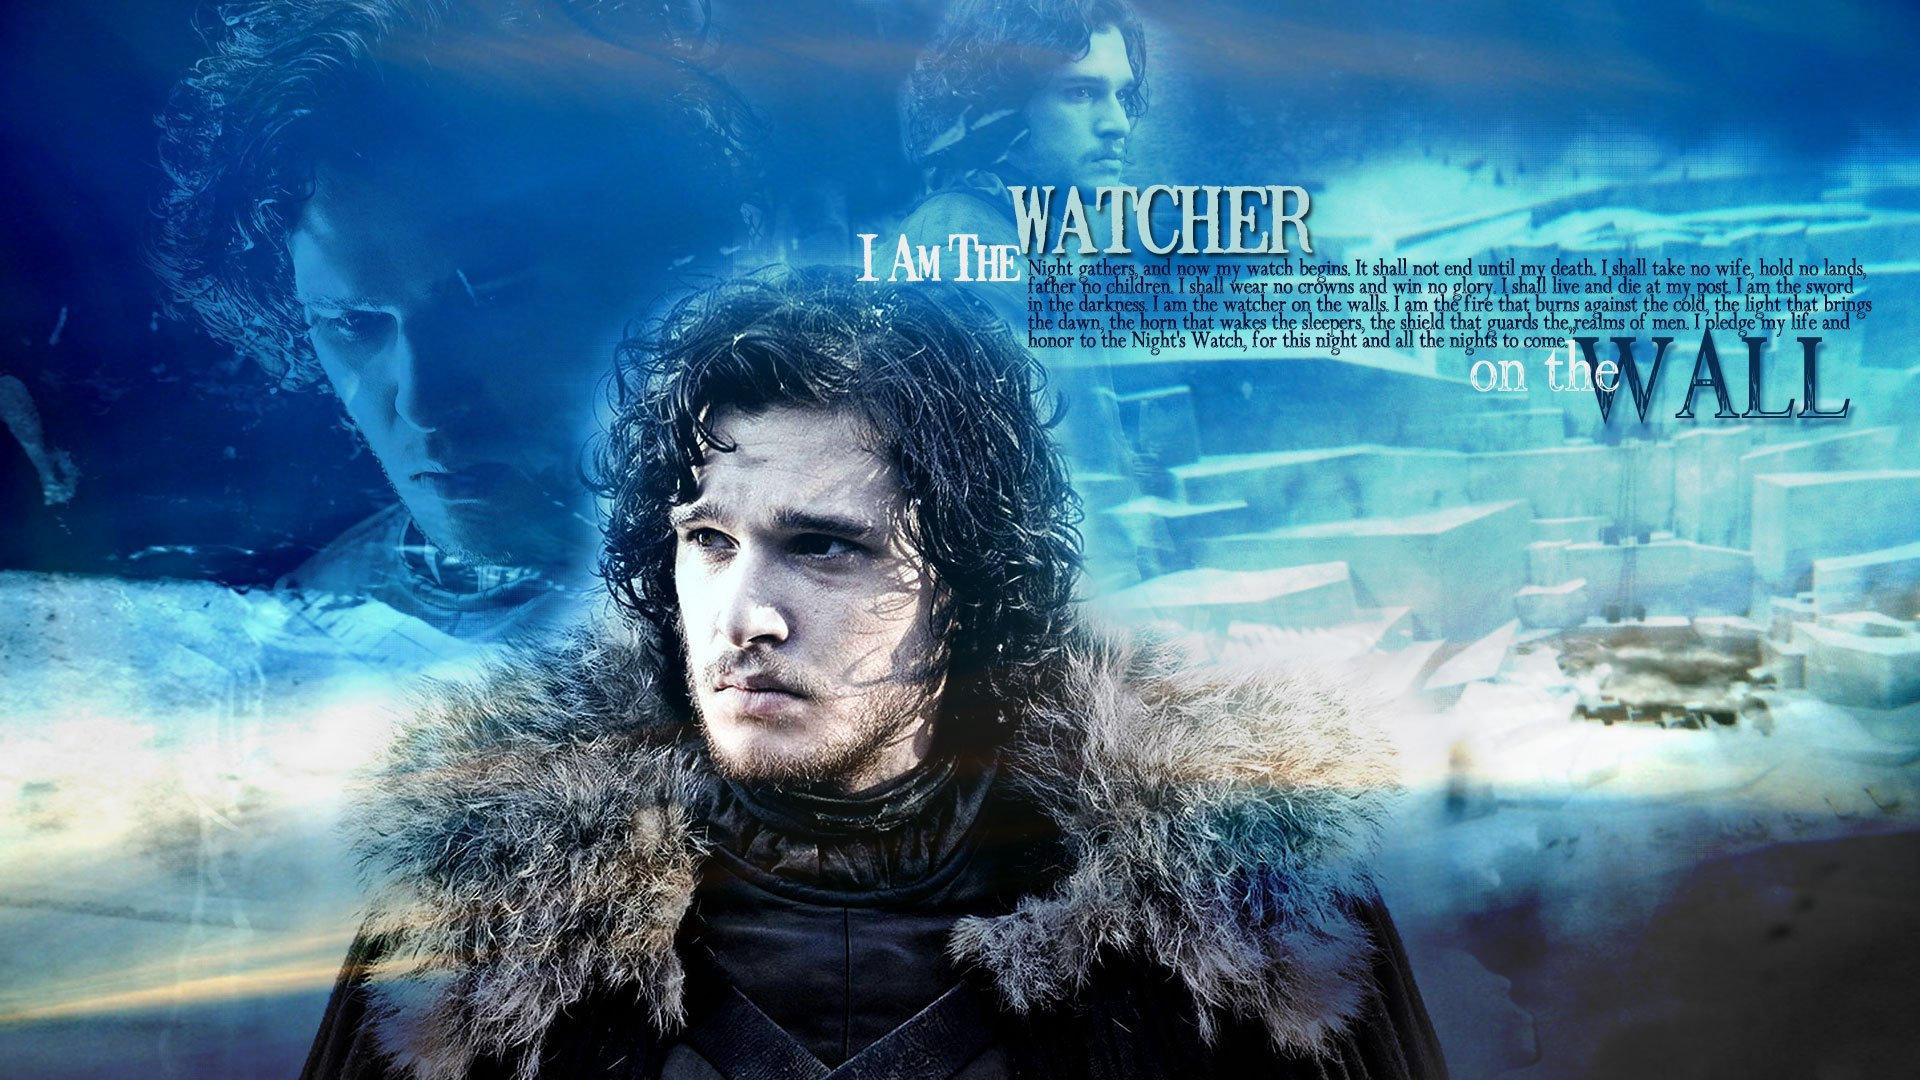 Jon Snow Wallpapers Hd For Desktop Backgrounds